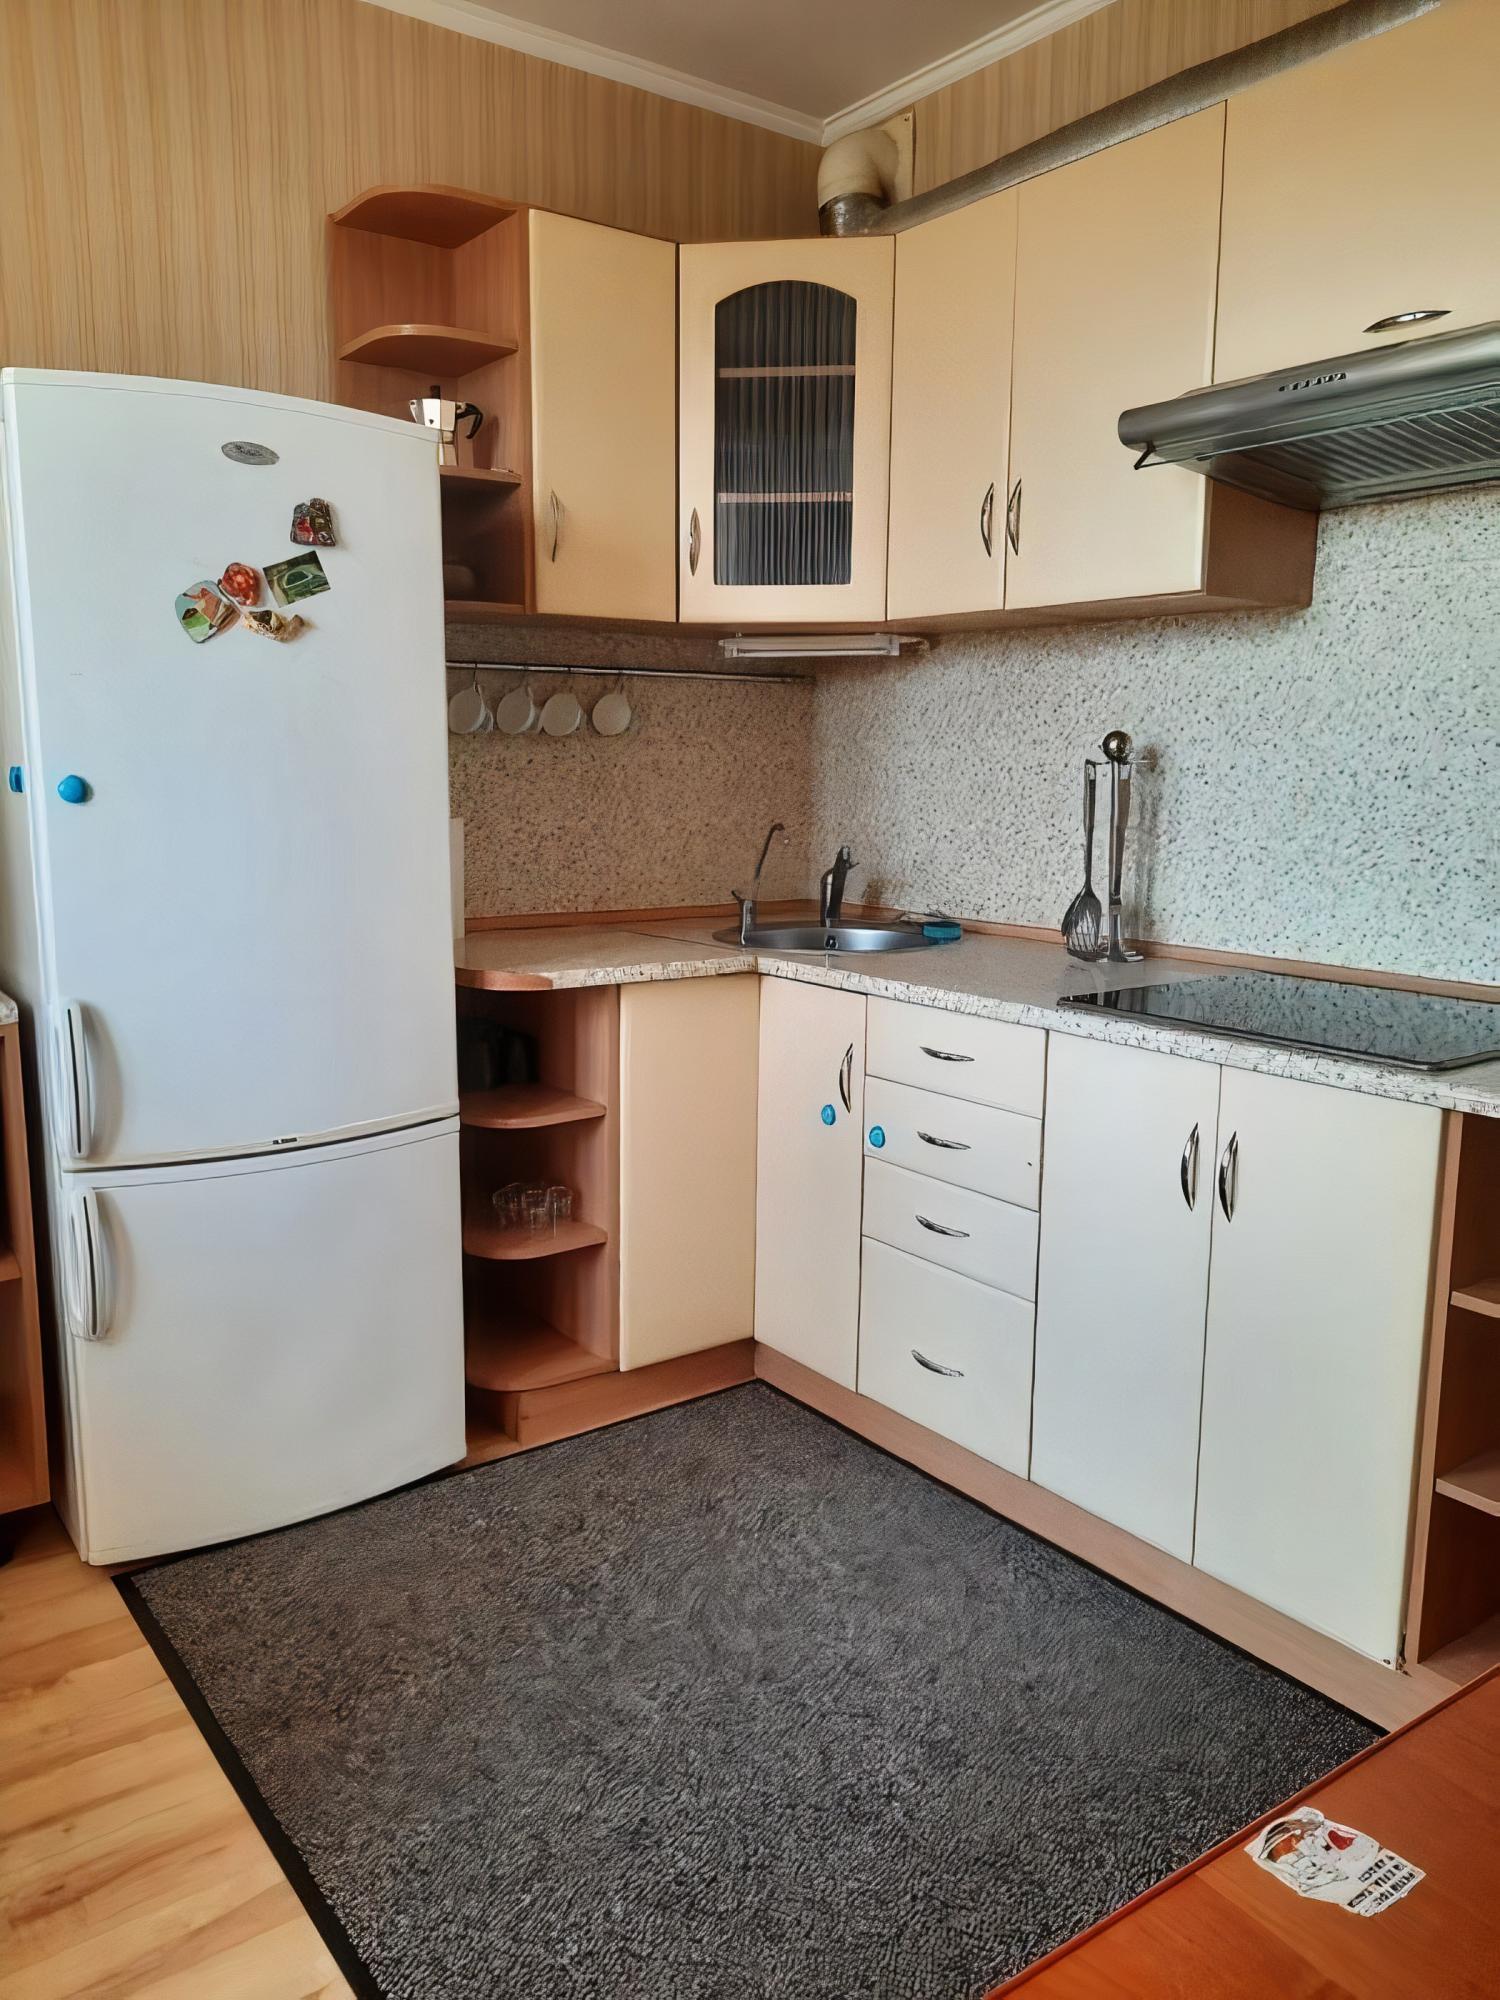 1к квартира проспект Металлургов, 51   13000   аренда в Красноярске фото 0